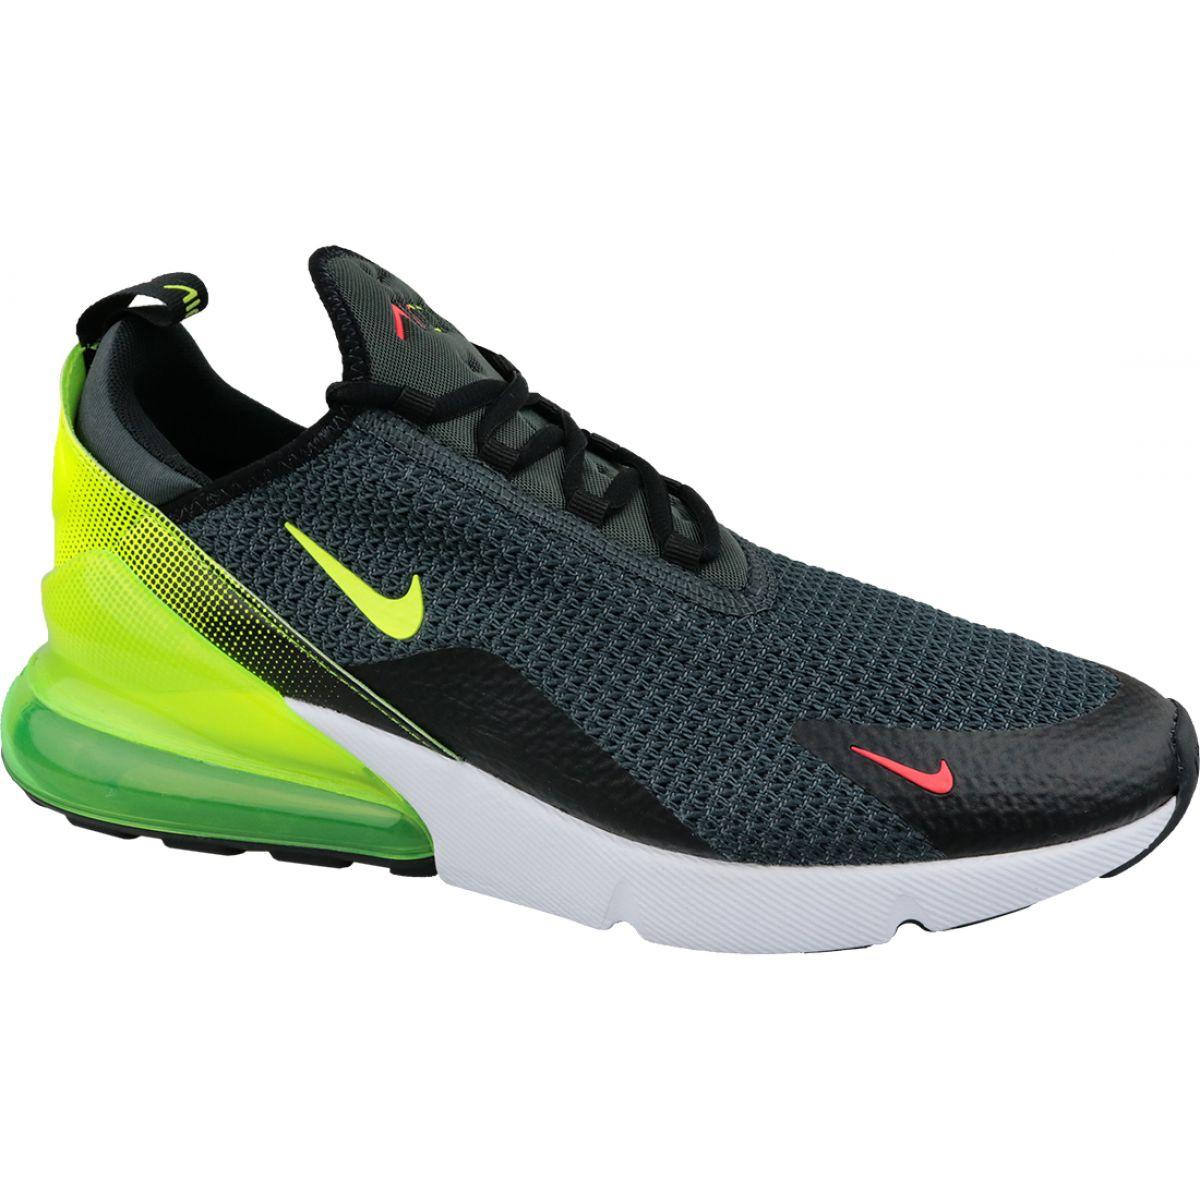 98c09e9e976110 Czarne Buty Nike Air Max 270 M AQ9164-005 - ButyModne.pl